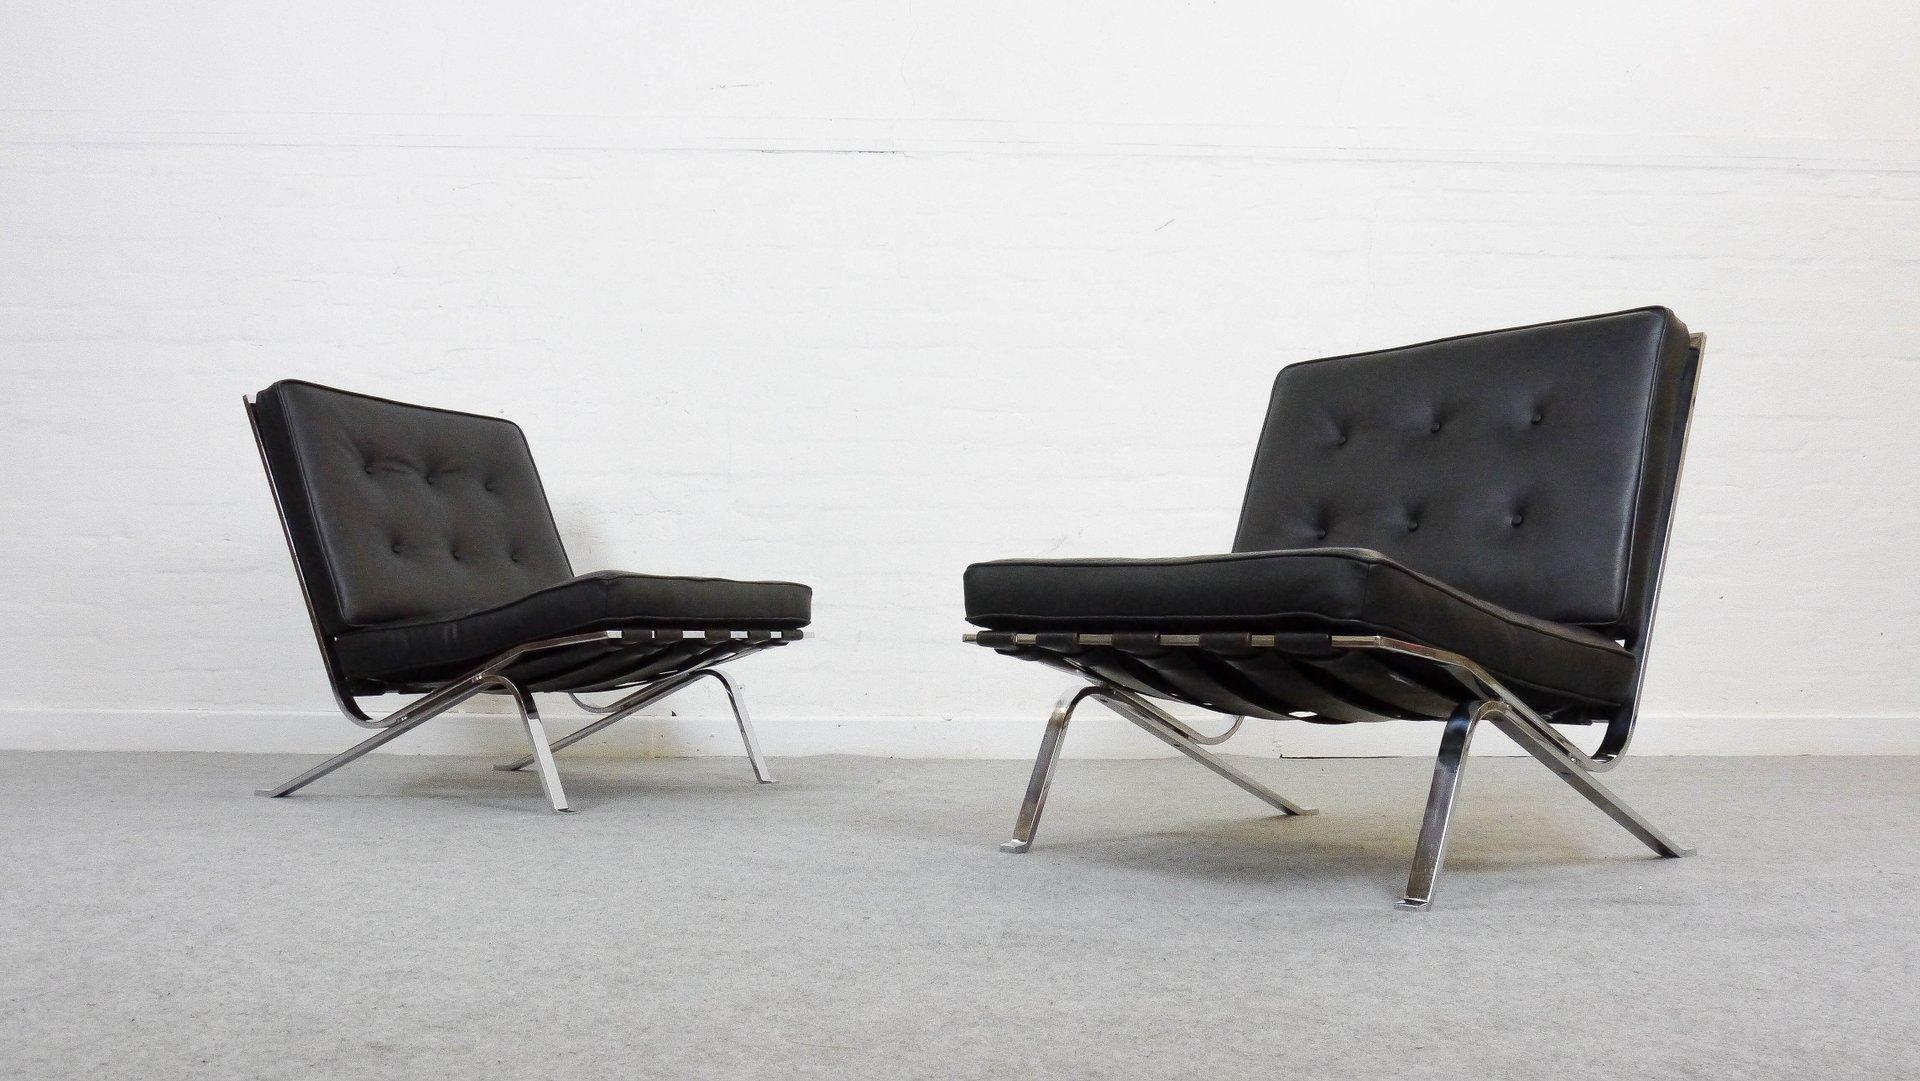 hausmann kleiderschranke. Black Bedroom Furniture Sets. Home Design Ideas